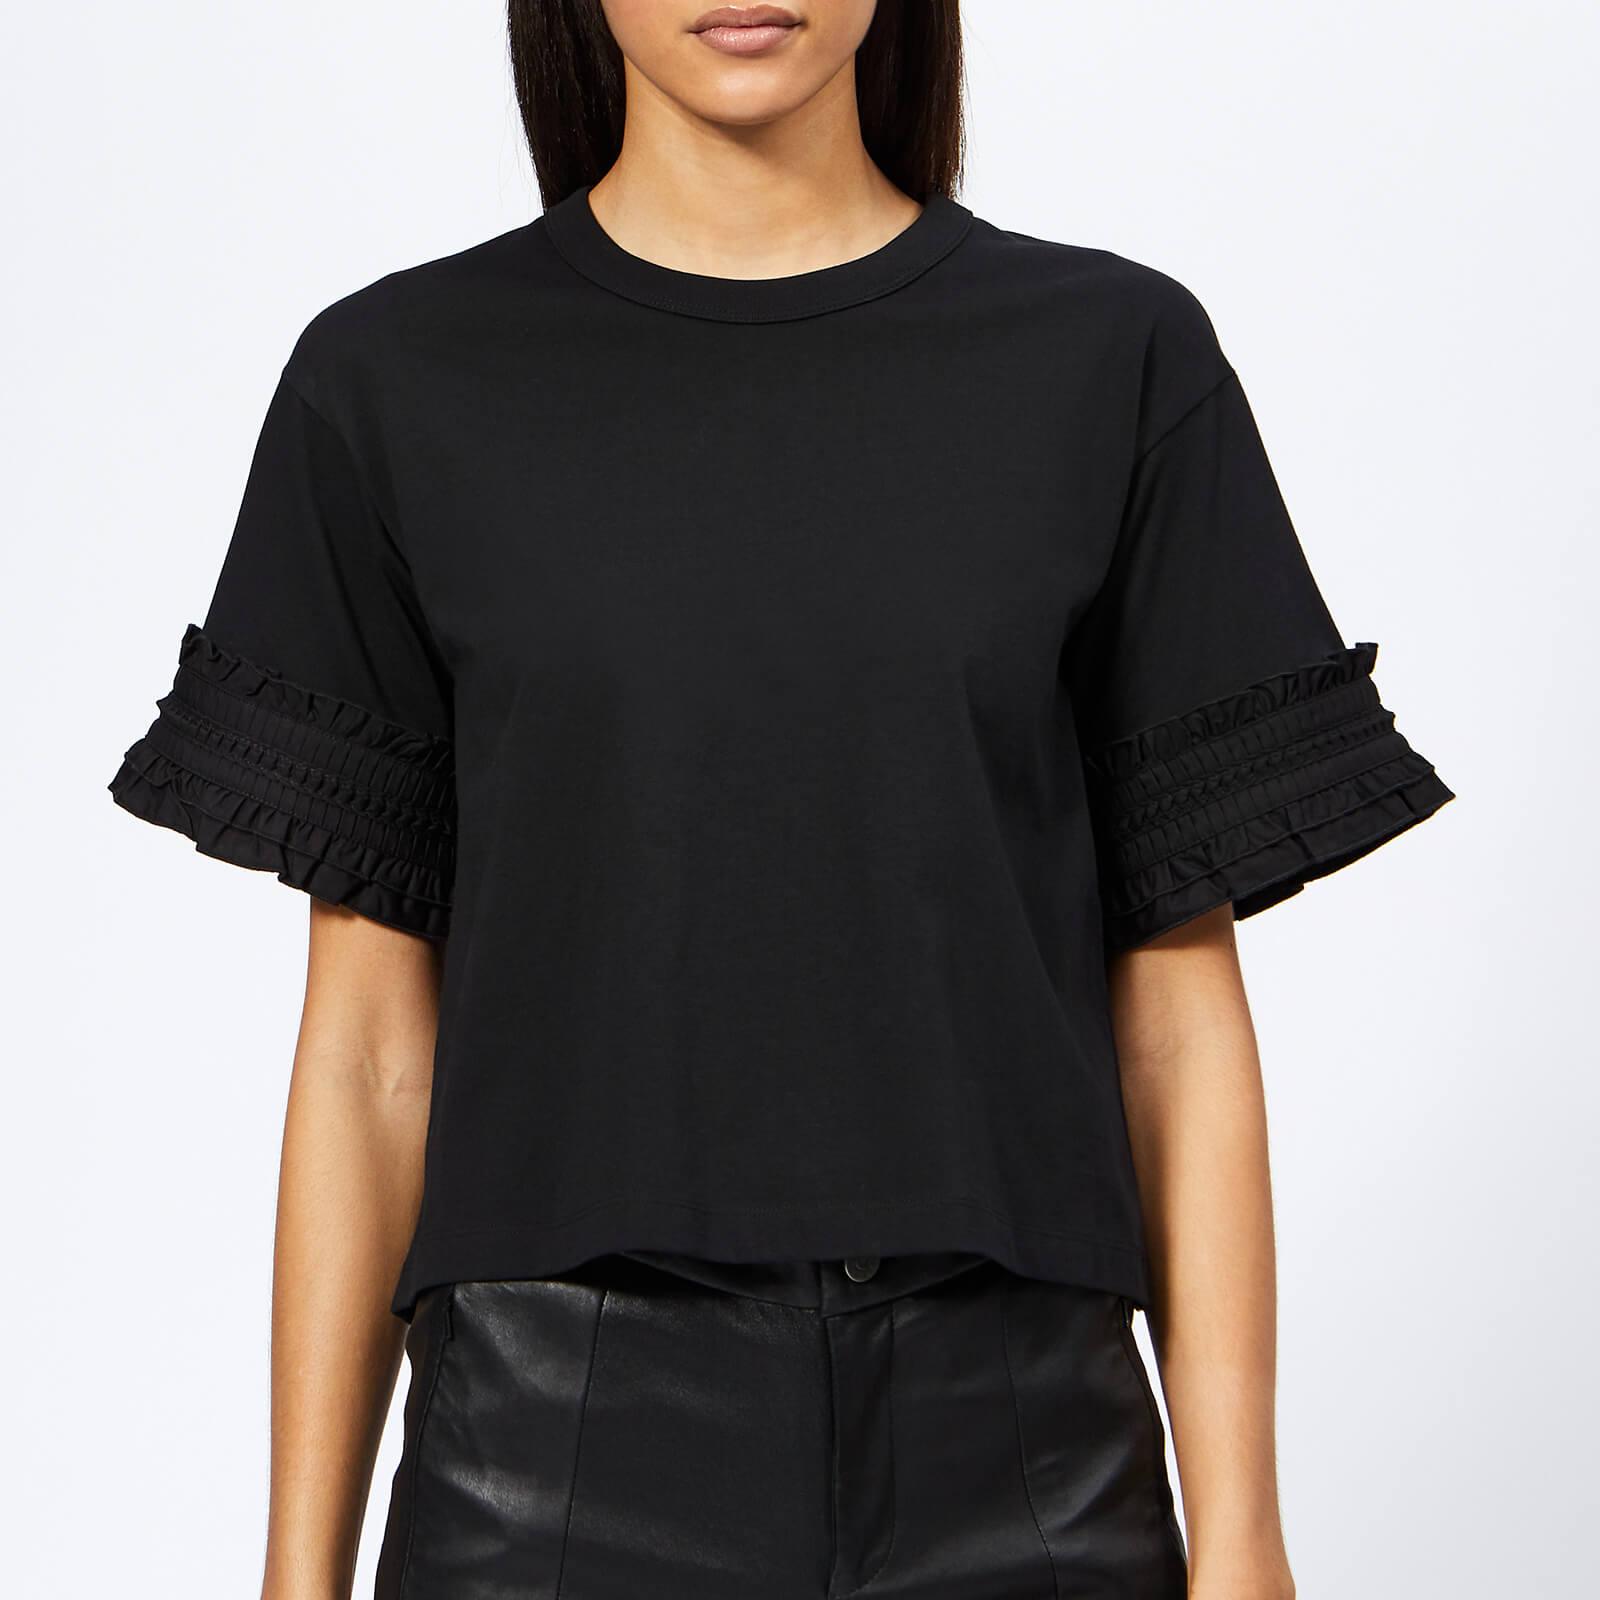 1b9f217dea See By Chloé Women's Sleeve Detail T-Shirt - Black